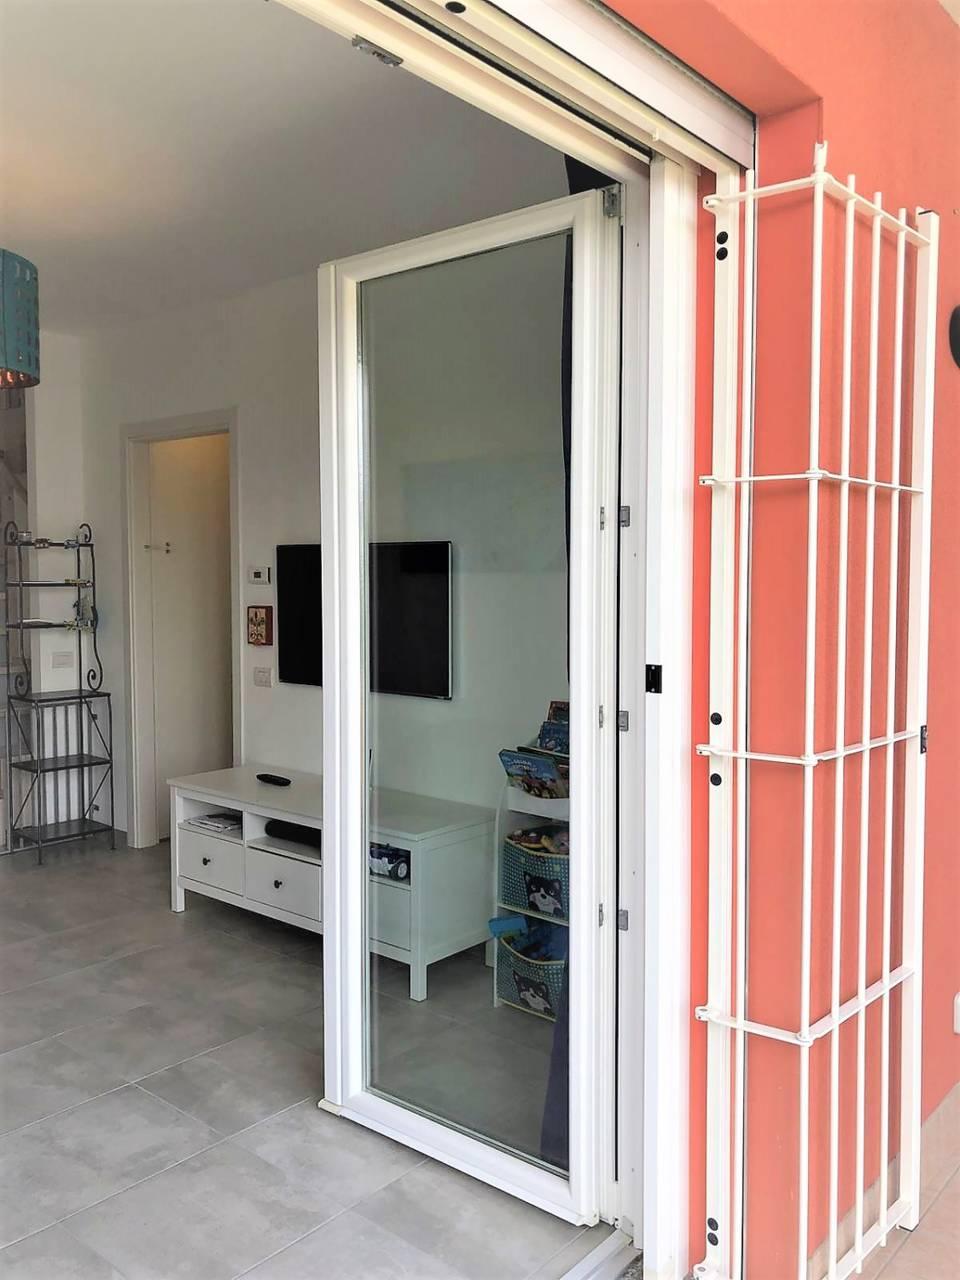 Appartamento-in-vendita-a-Busnago-in-Brianza-10